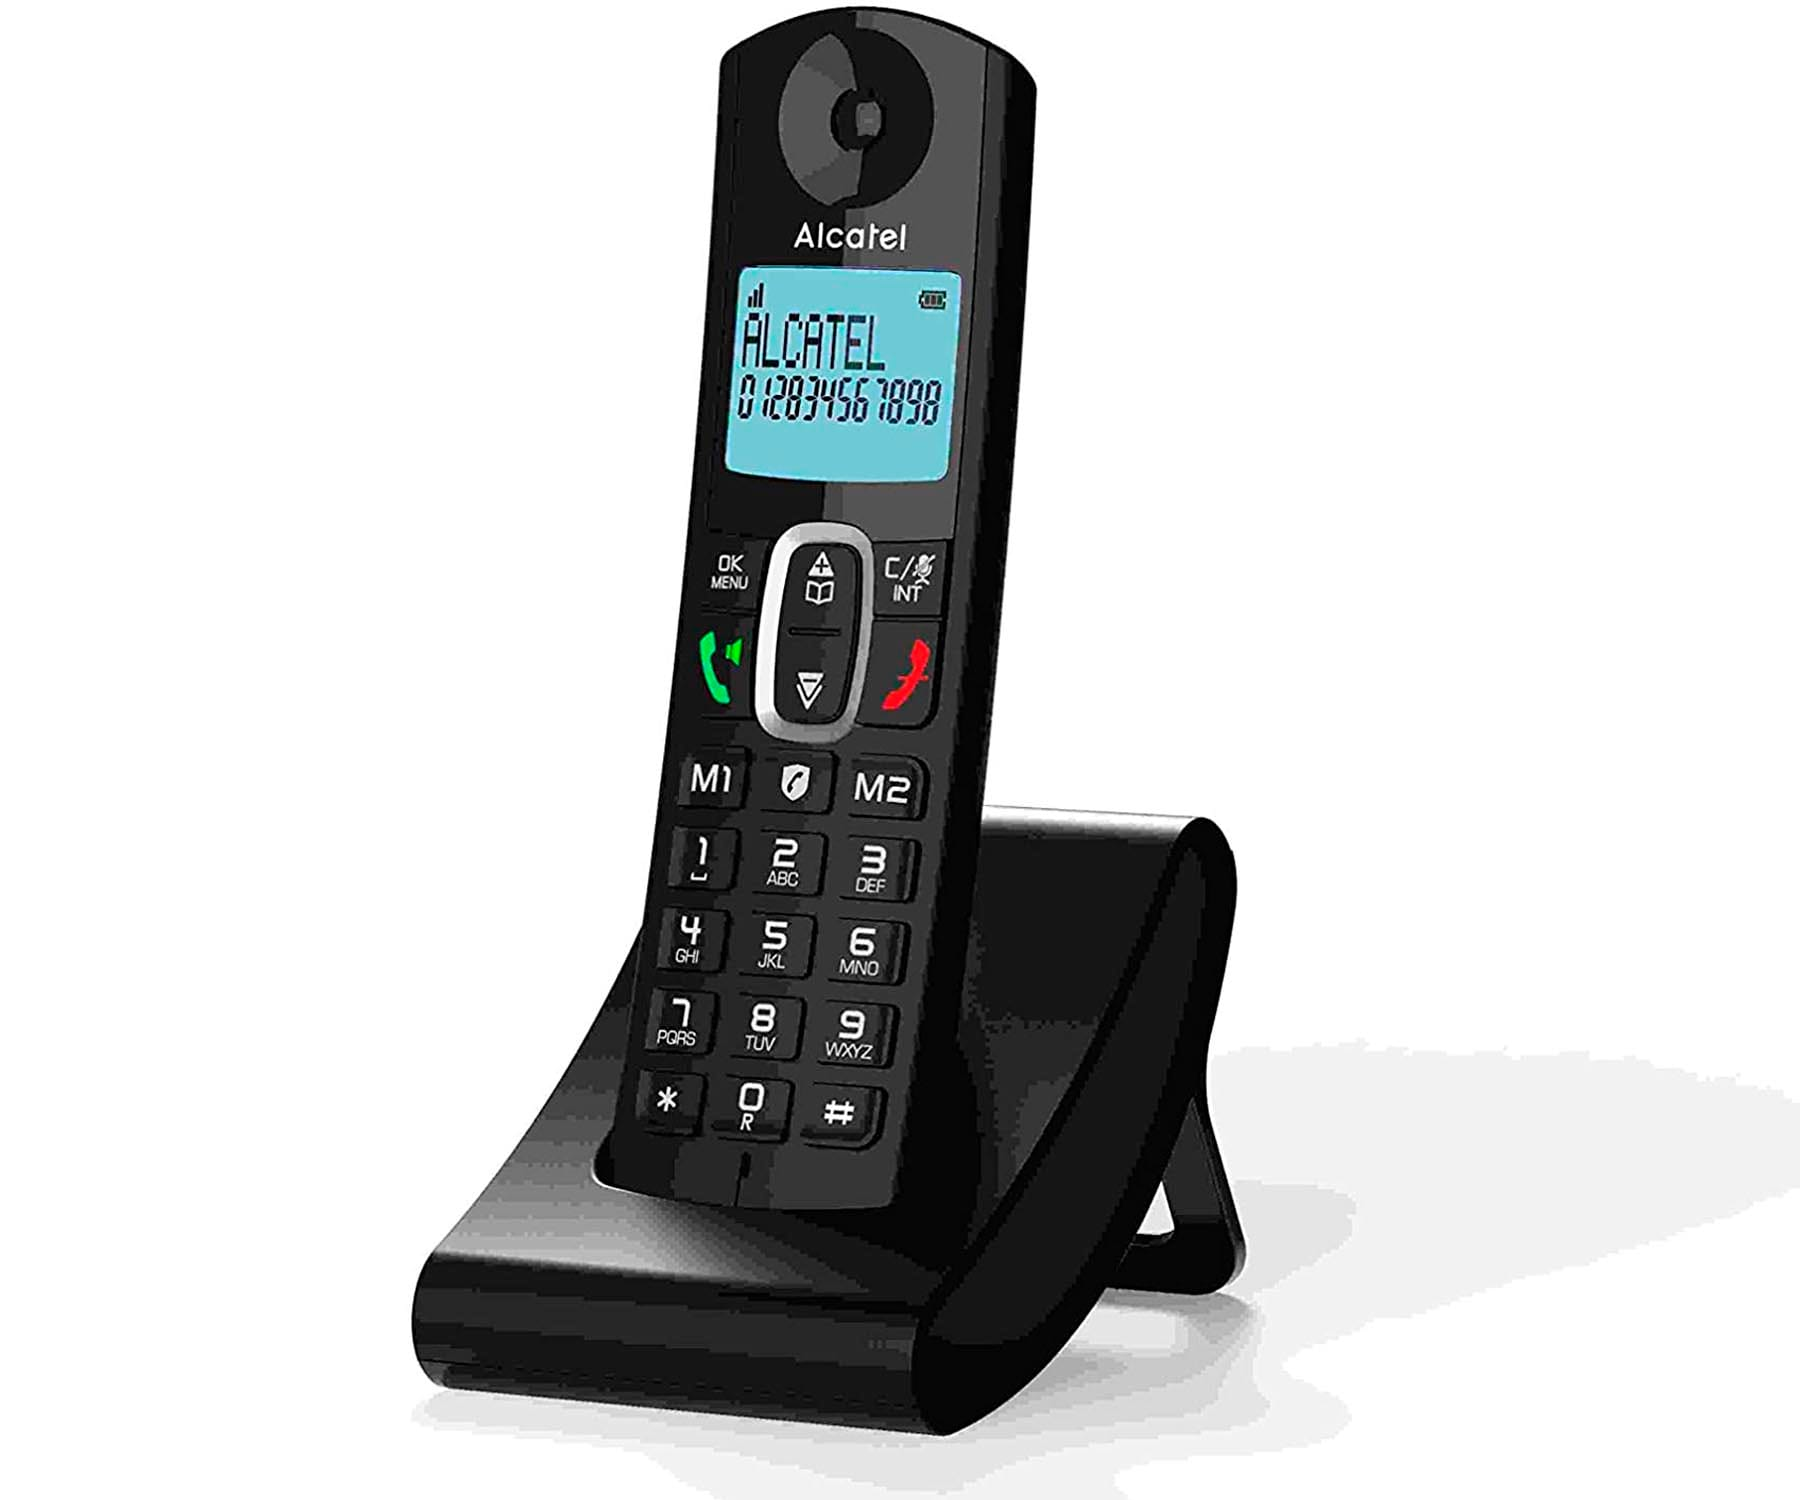 ALCATEL F685 NEGRO TELÉFONO FIJO INALÁMBRICO PANTALLA RETROILUMINADA